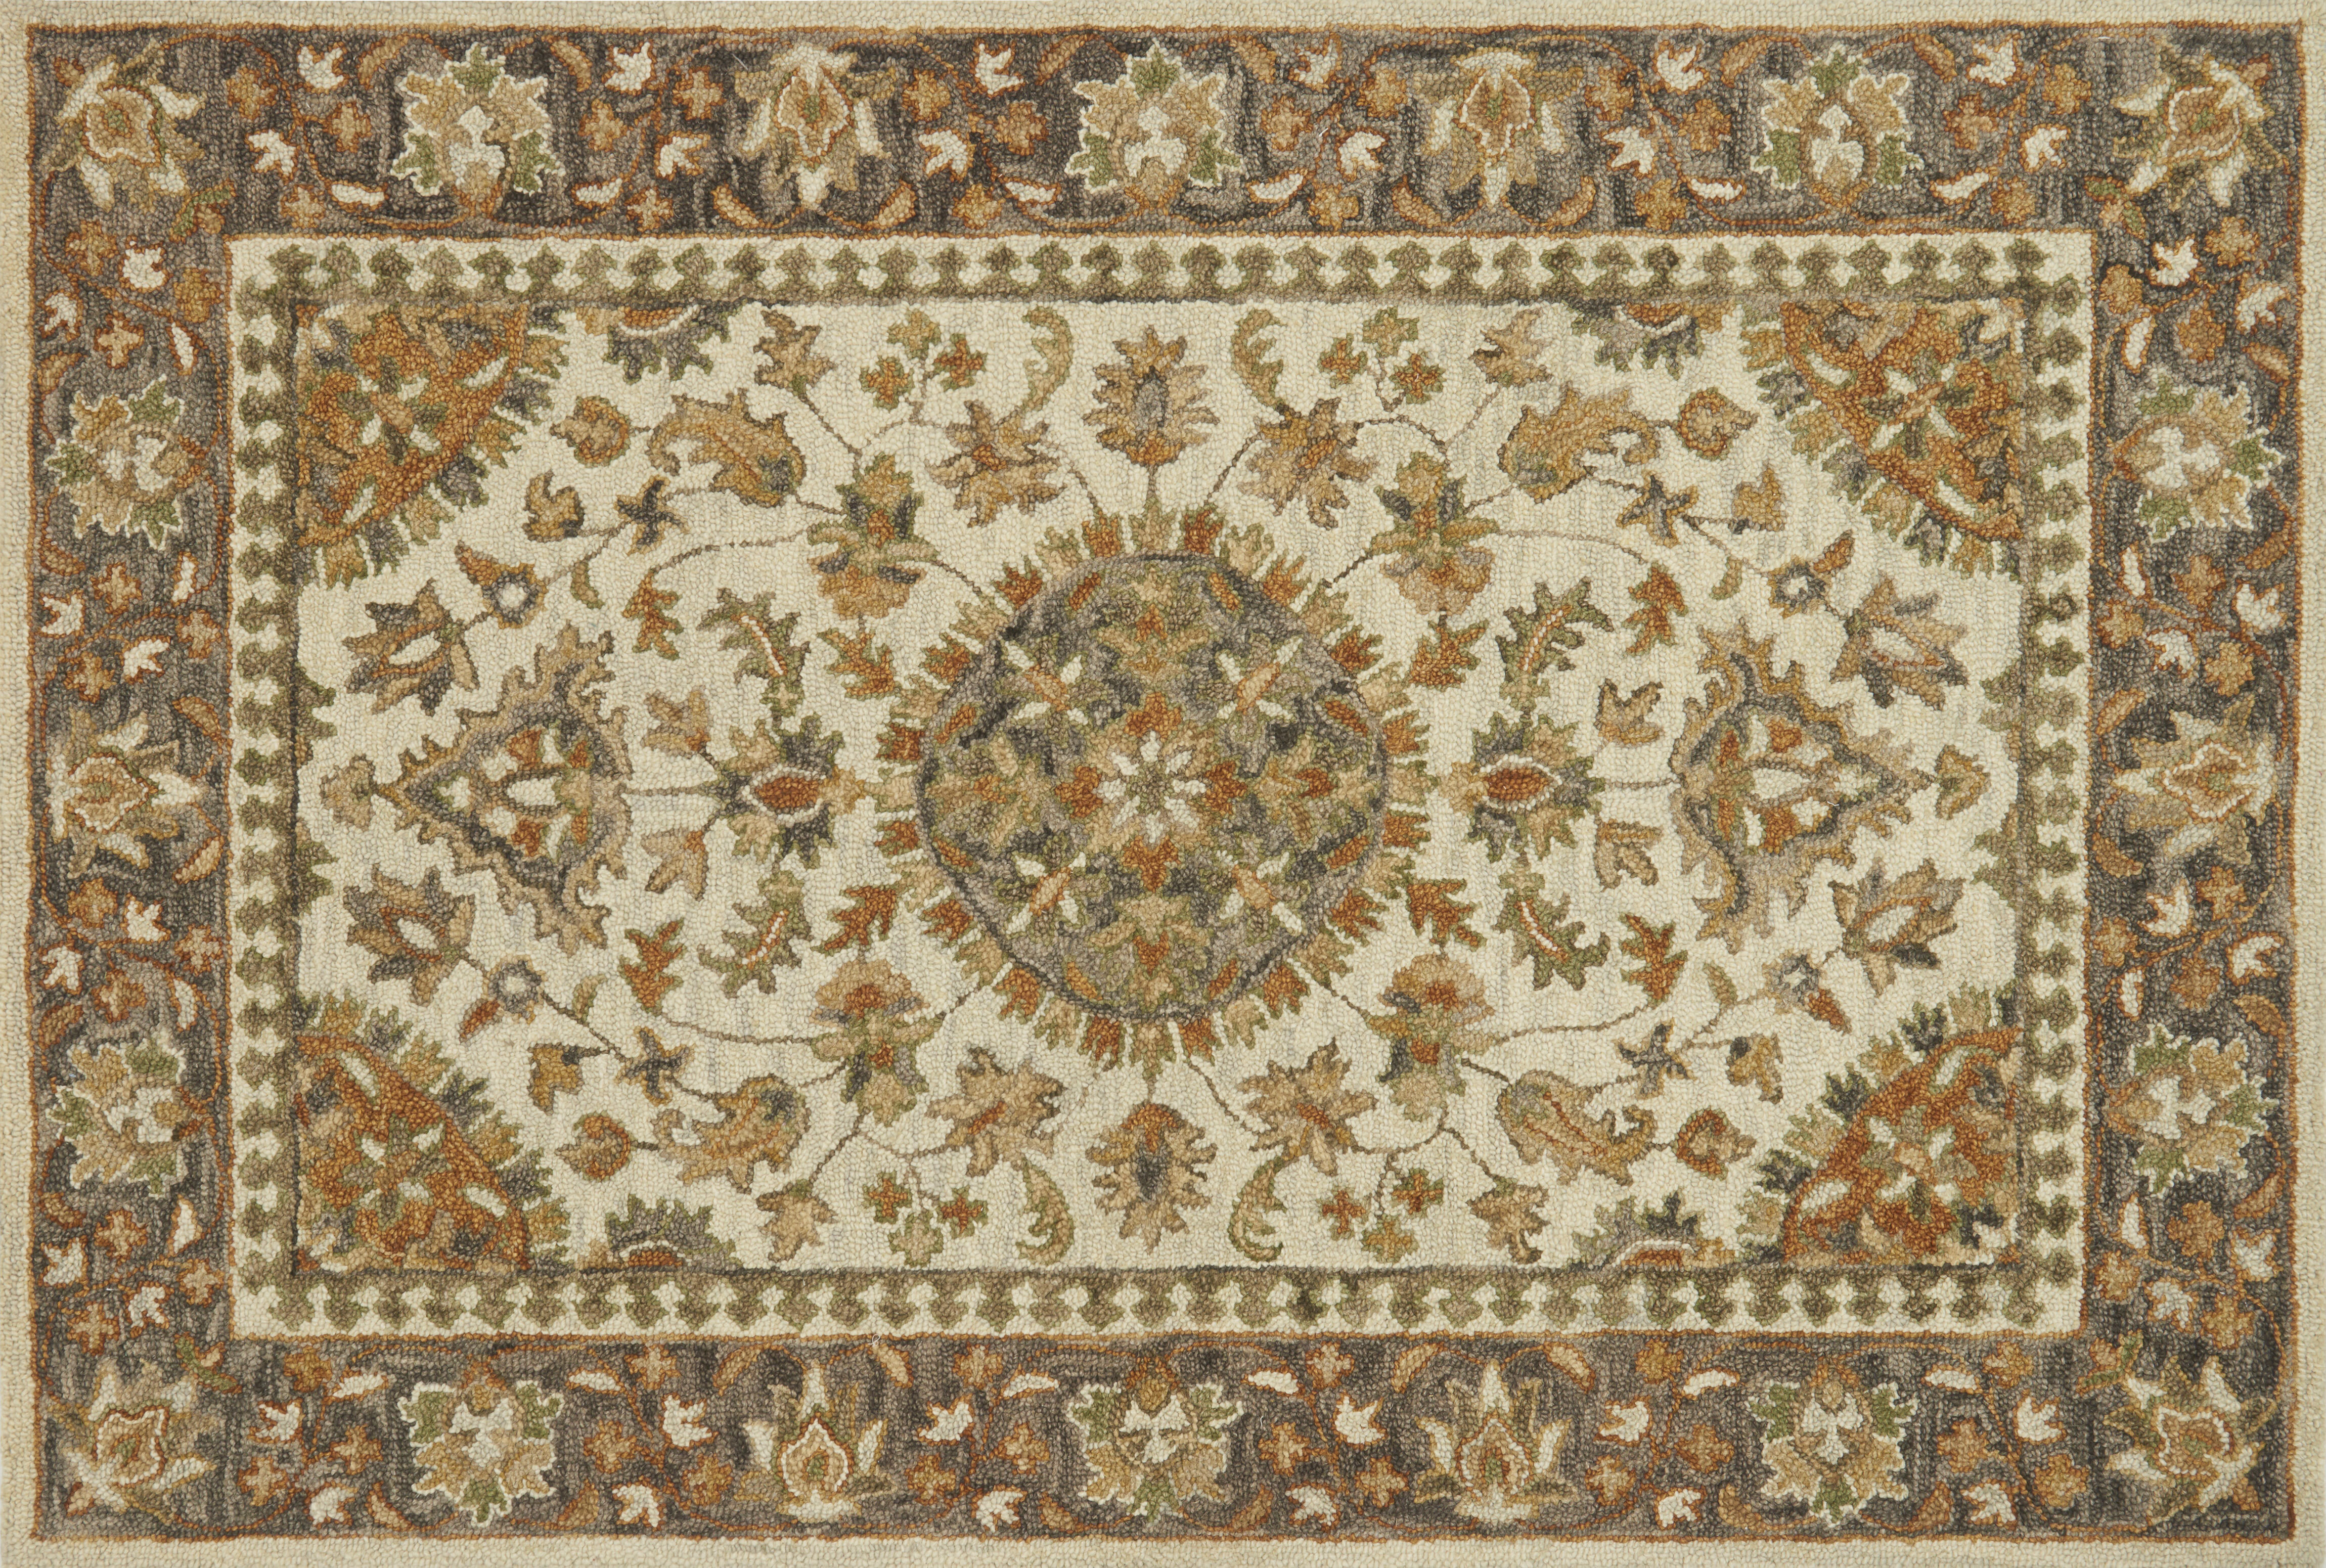 Rug Cleaners Watertown Machusetts Carpet Vidalondon